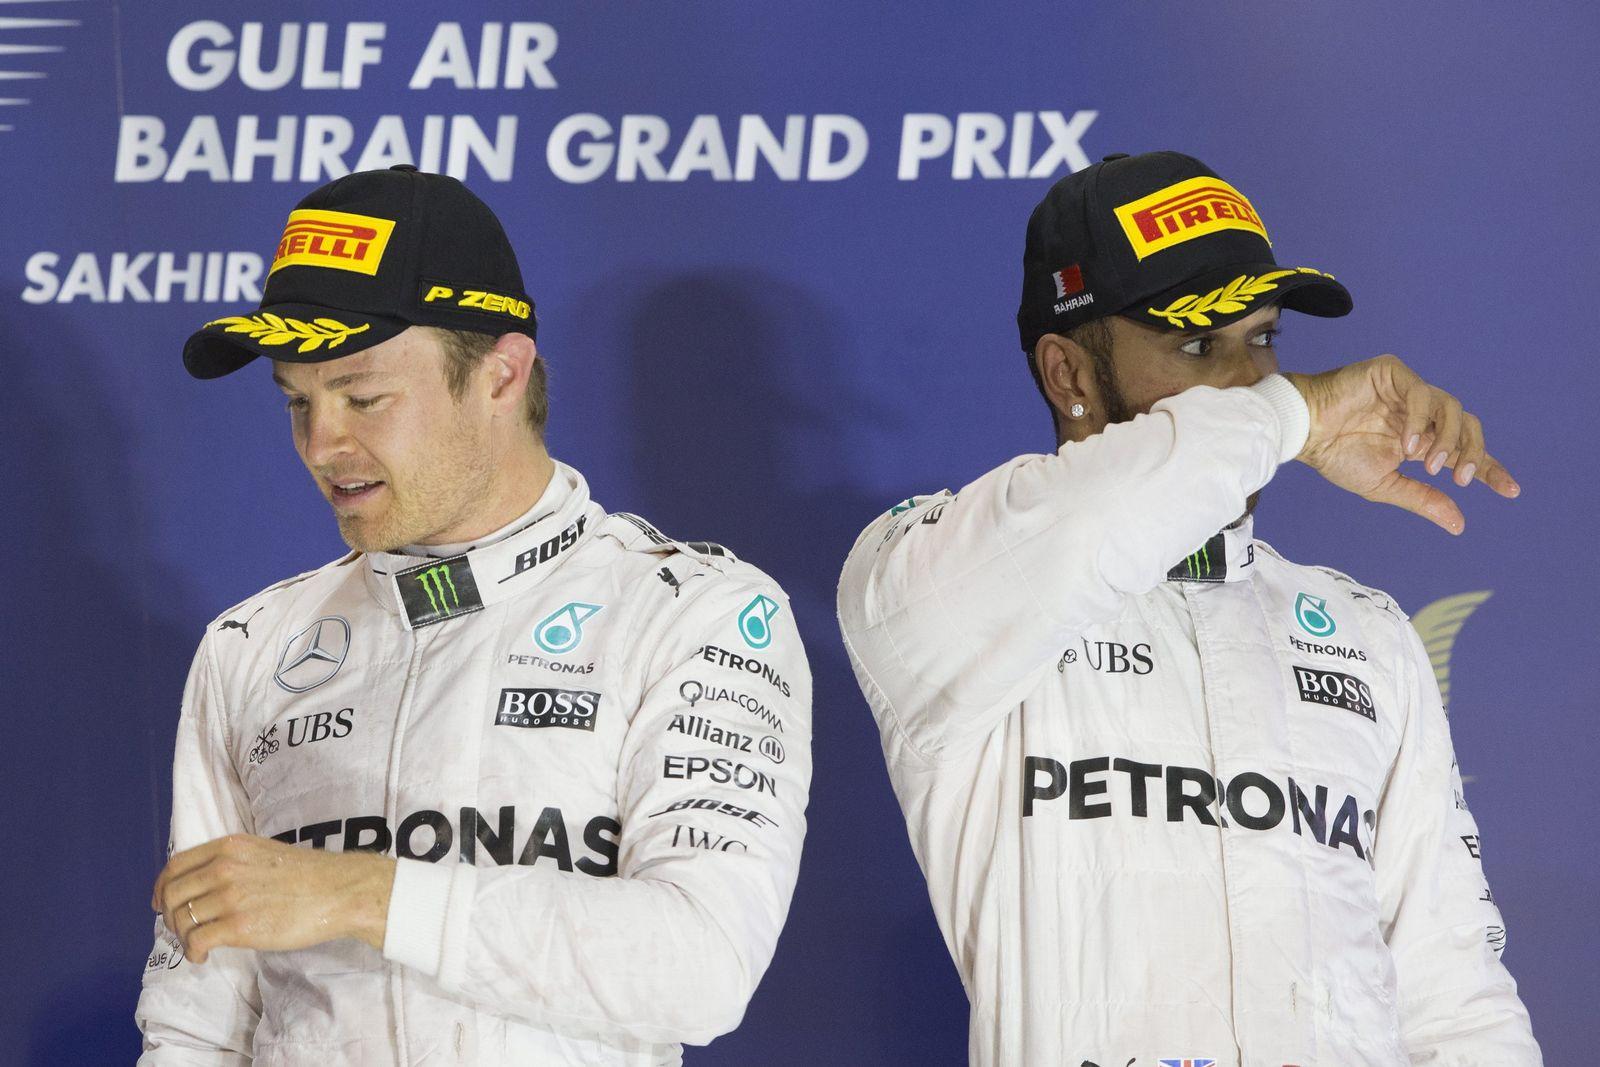 Bahrain Formula One Grand Prix